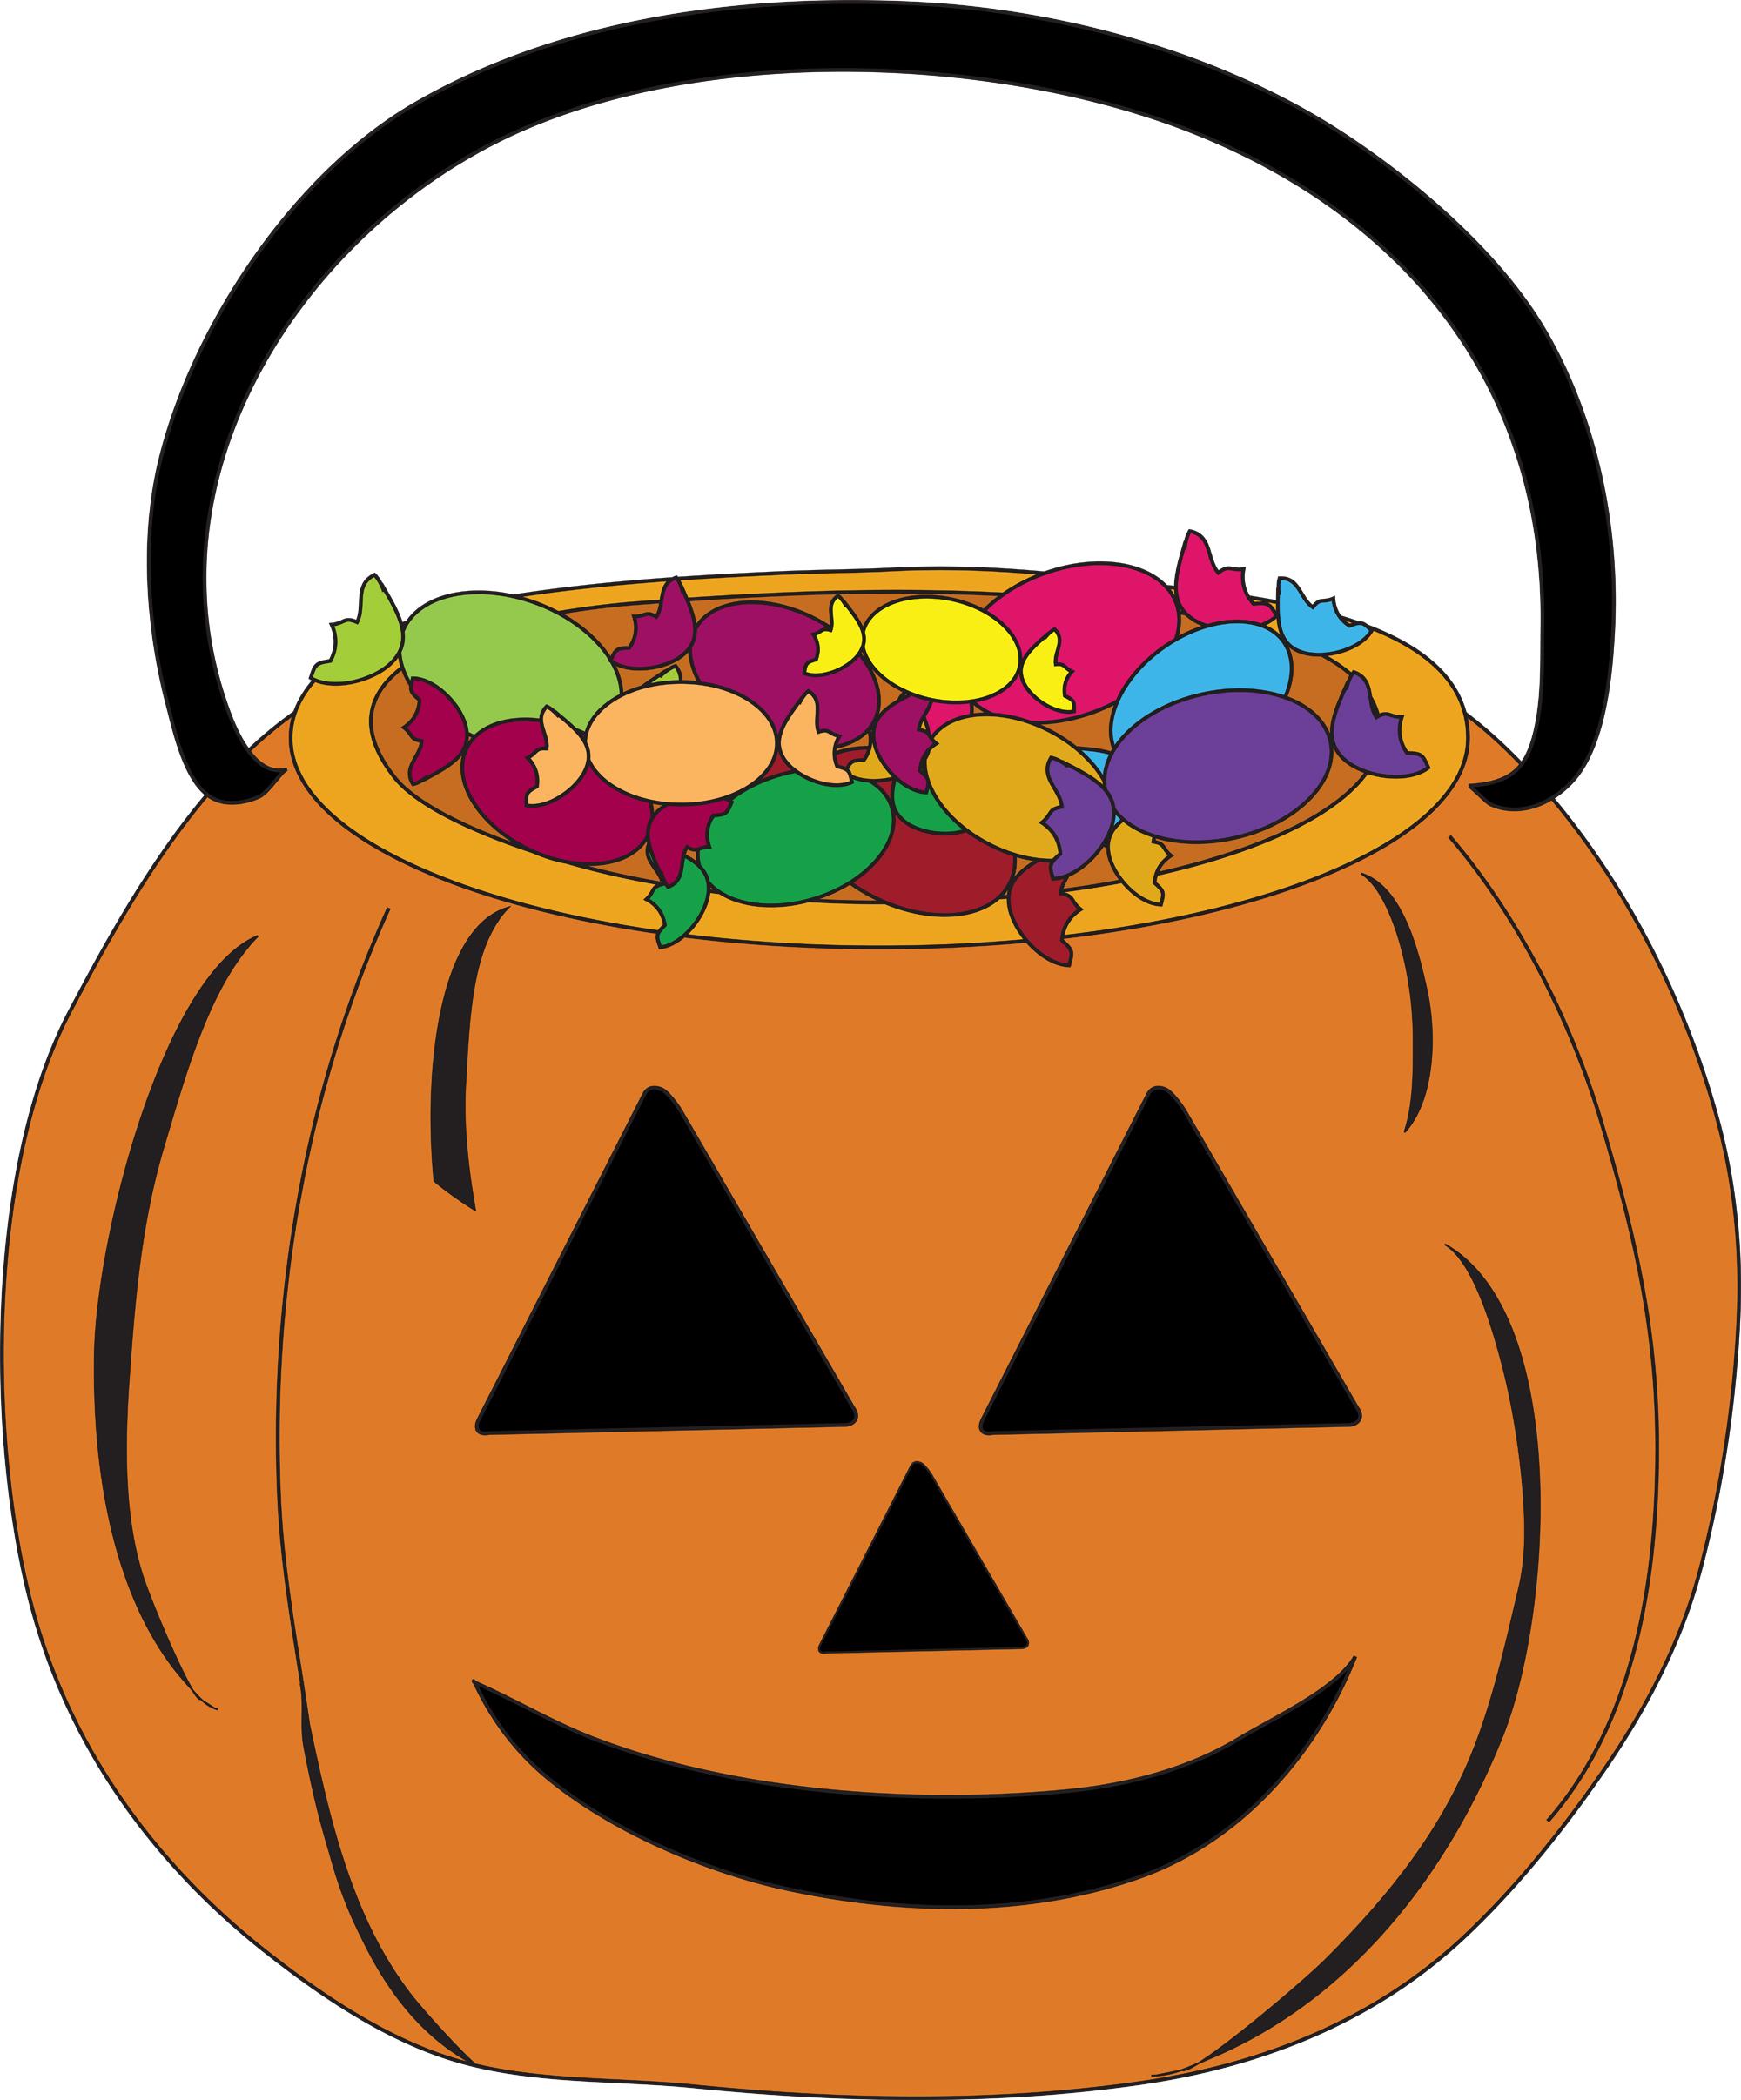 Happy Halloween Pumpkin Clipart | Free download on ClipArtMag